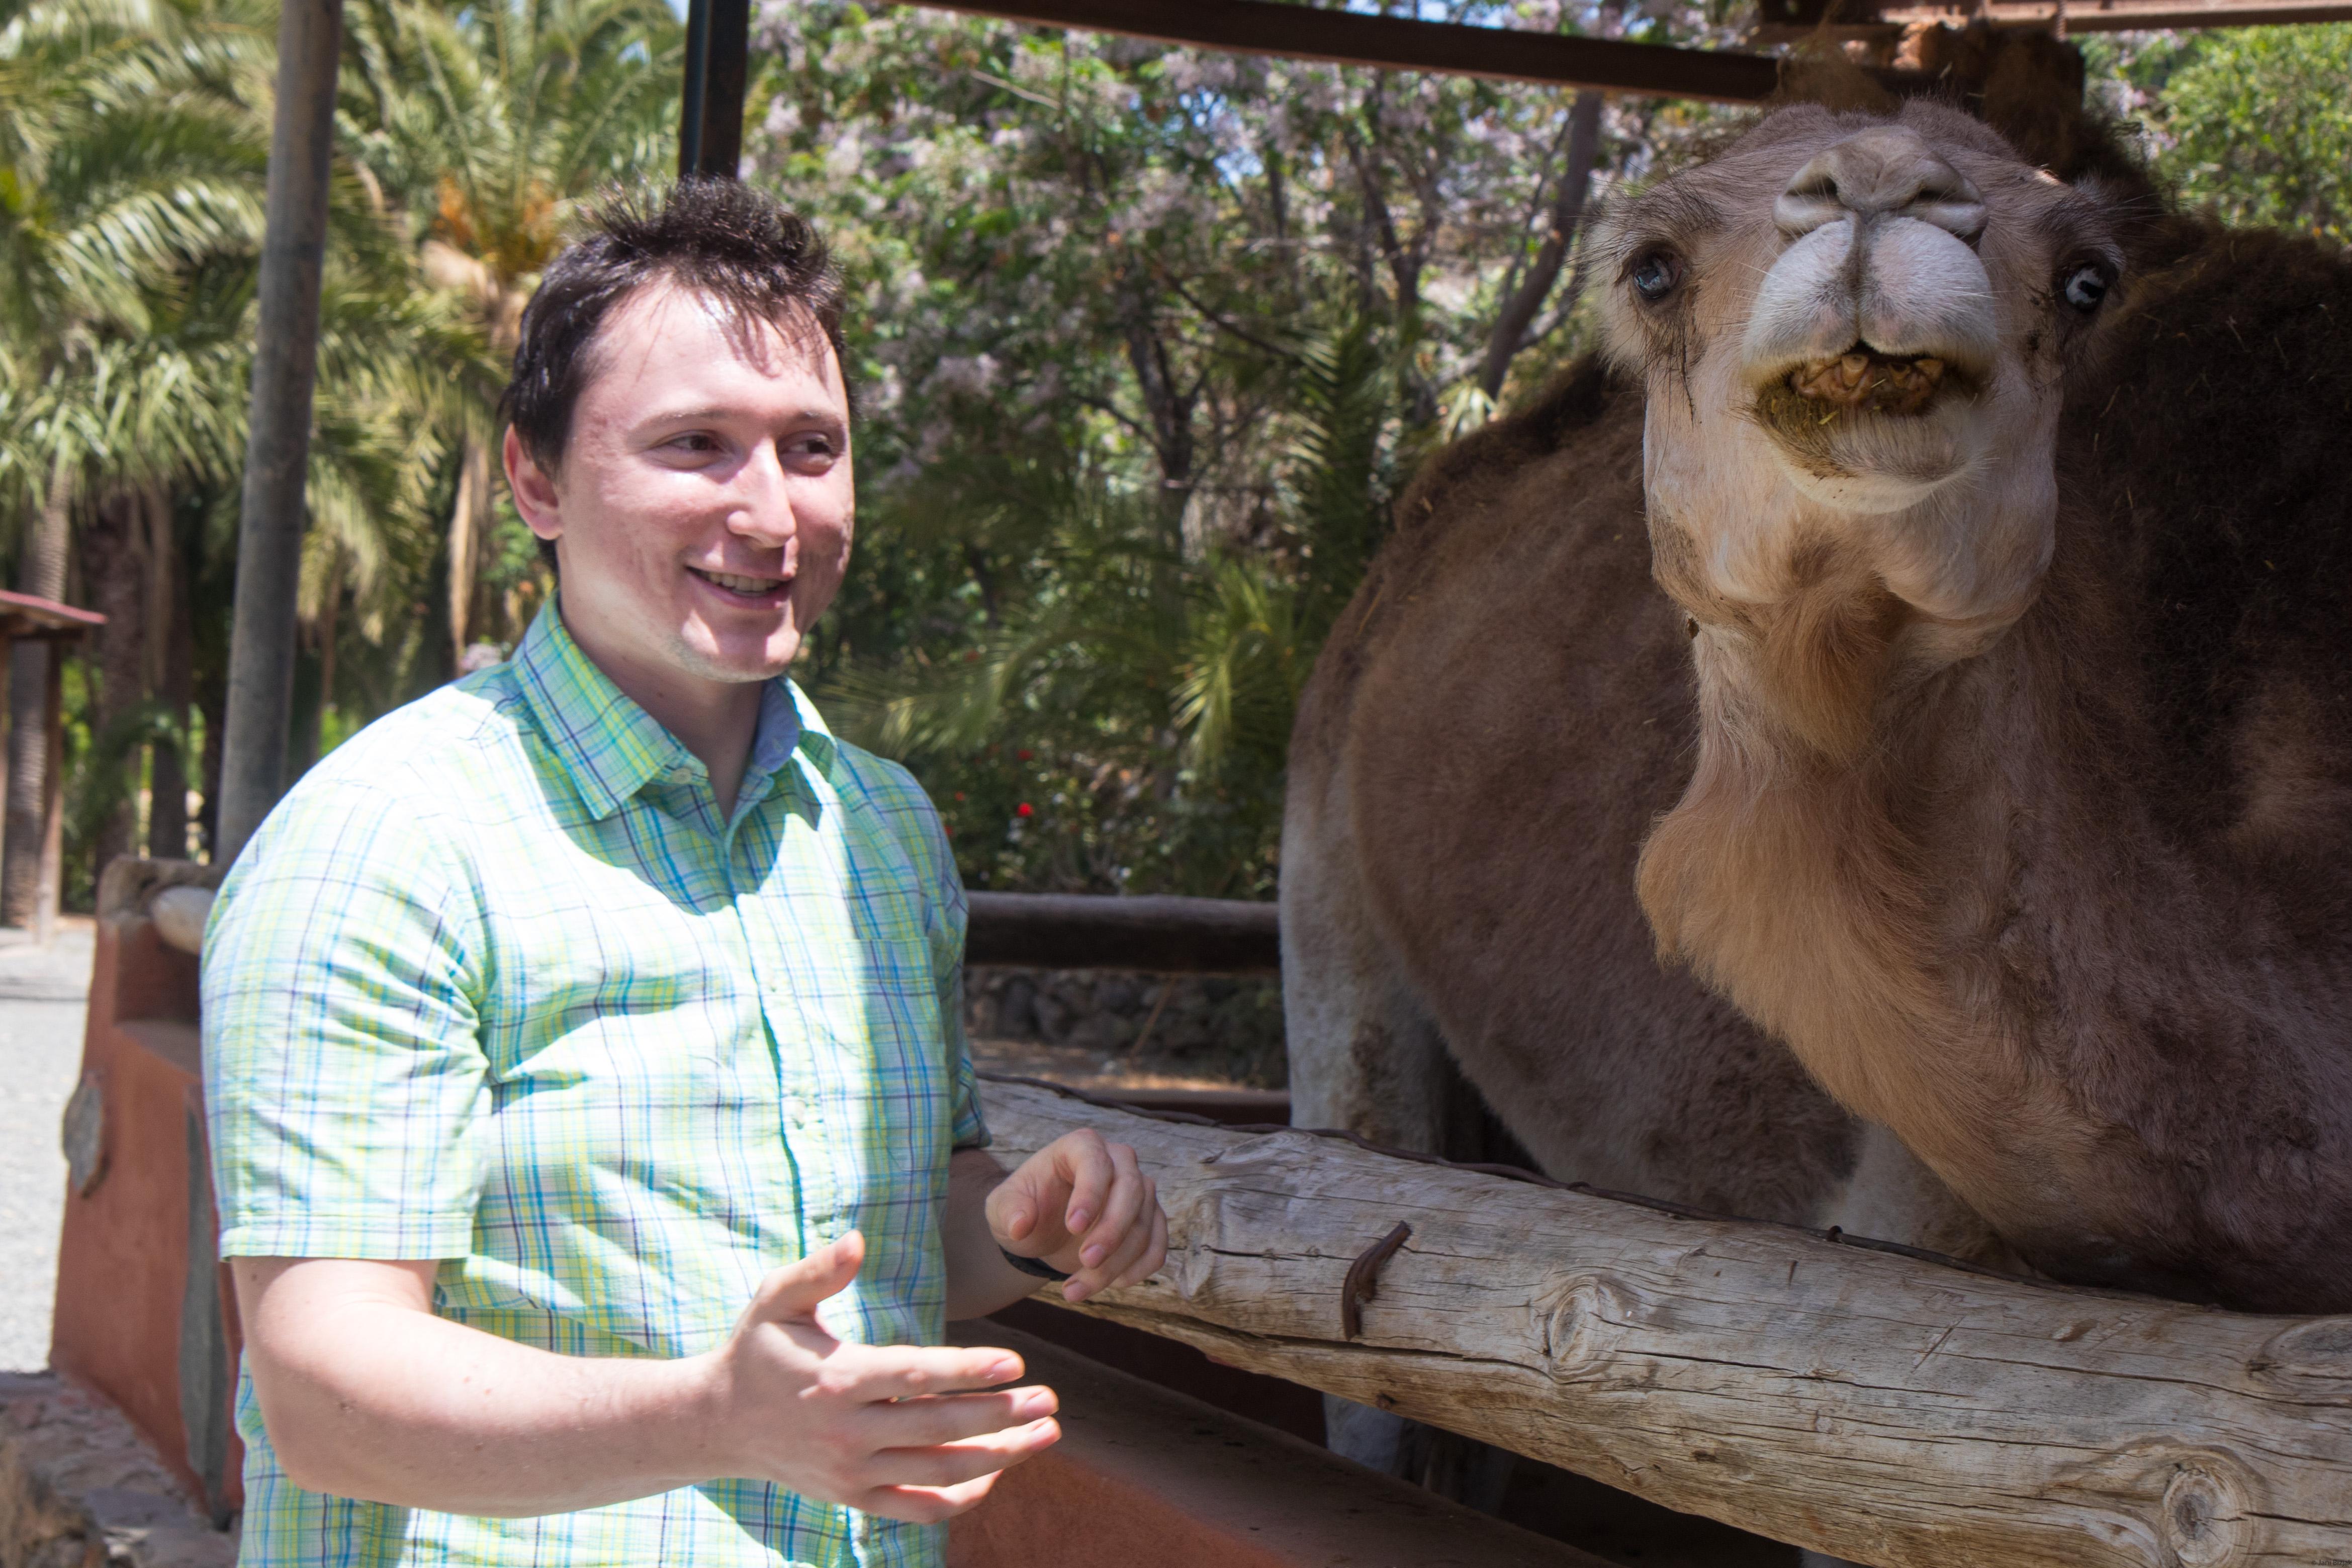 Petting a camel.